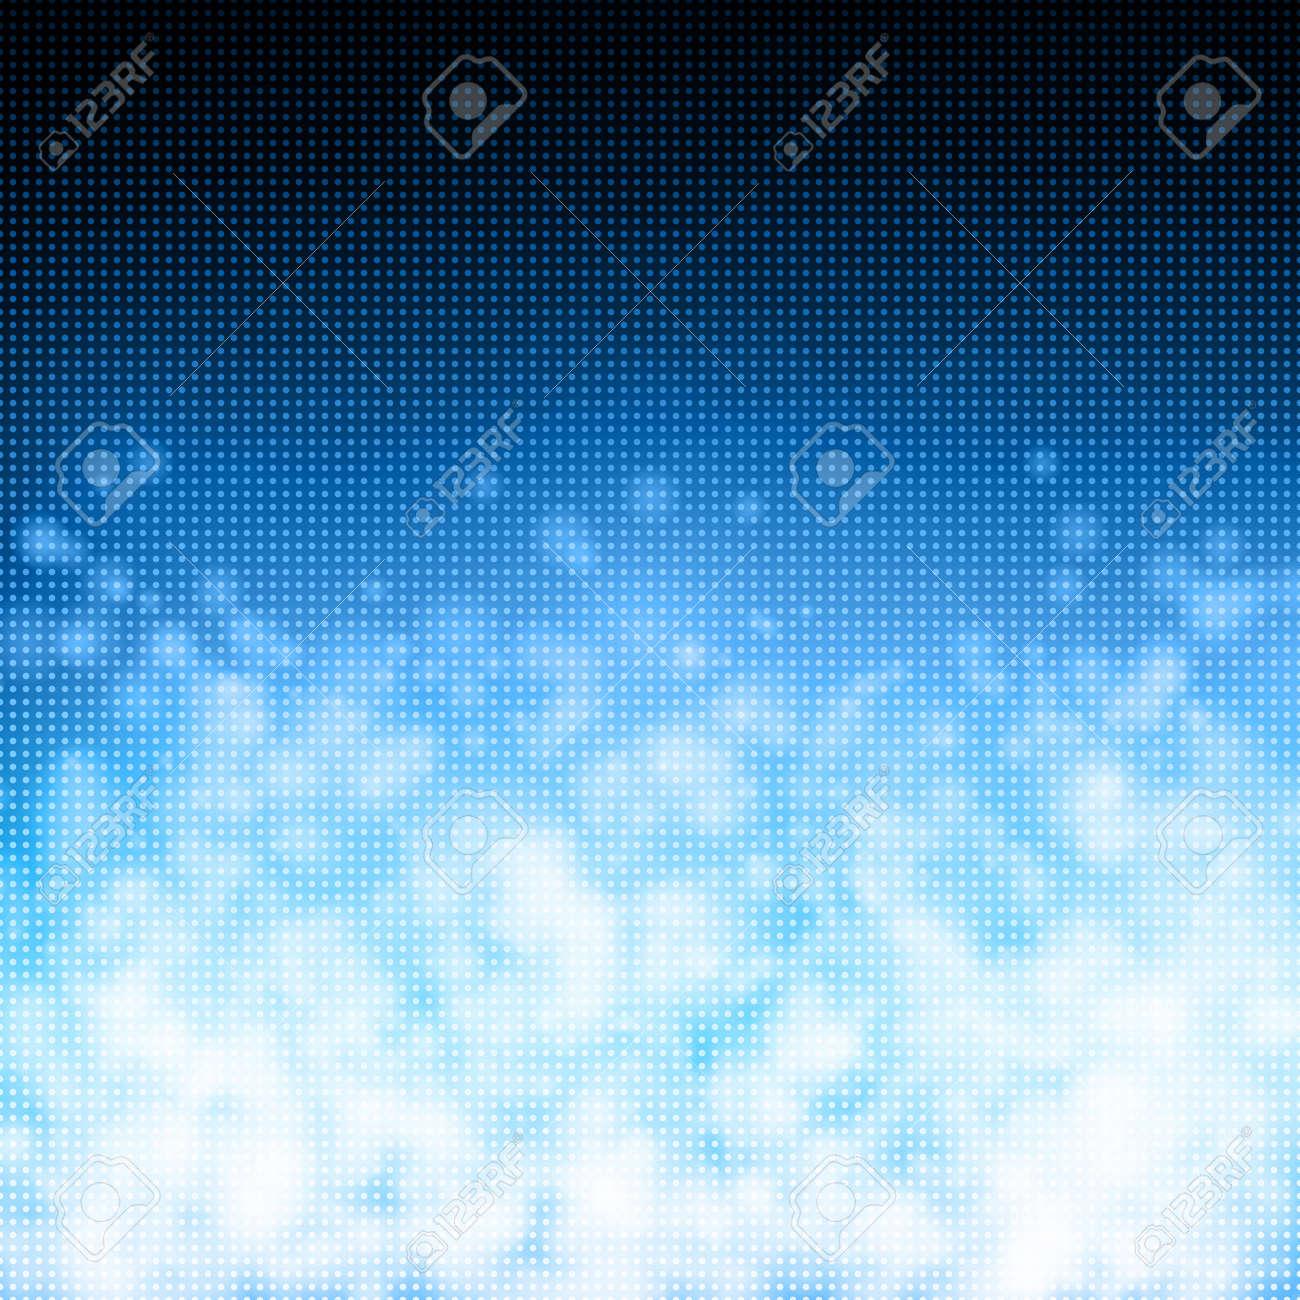 Bubbles on matrix technology background - 14515956